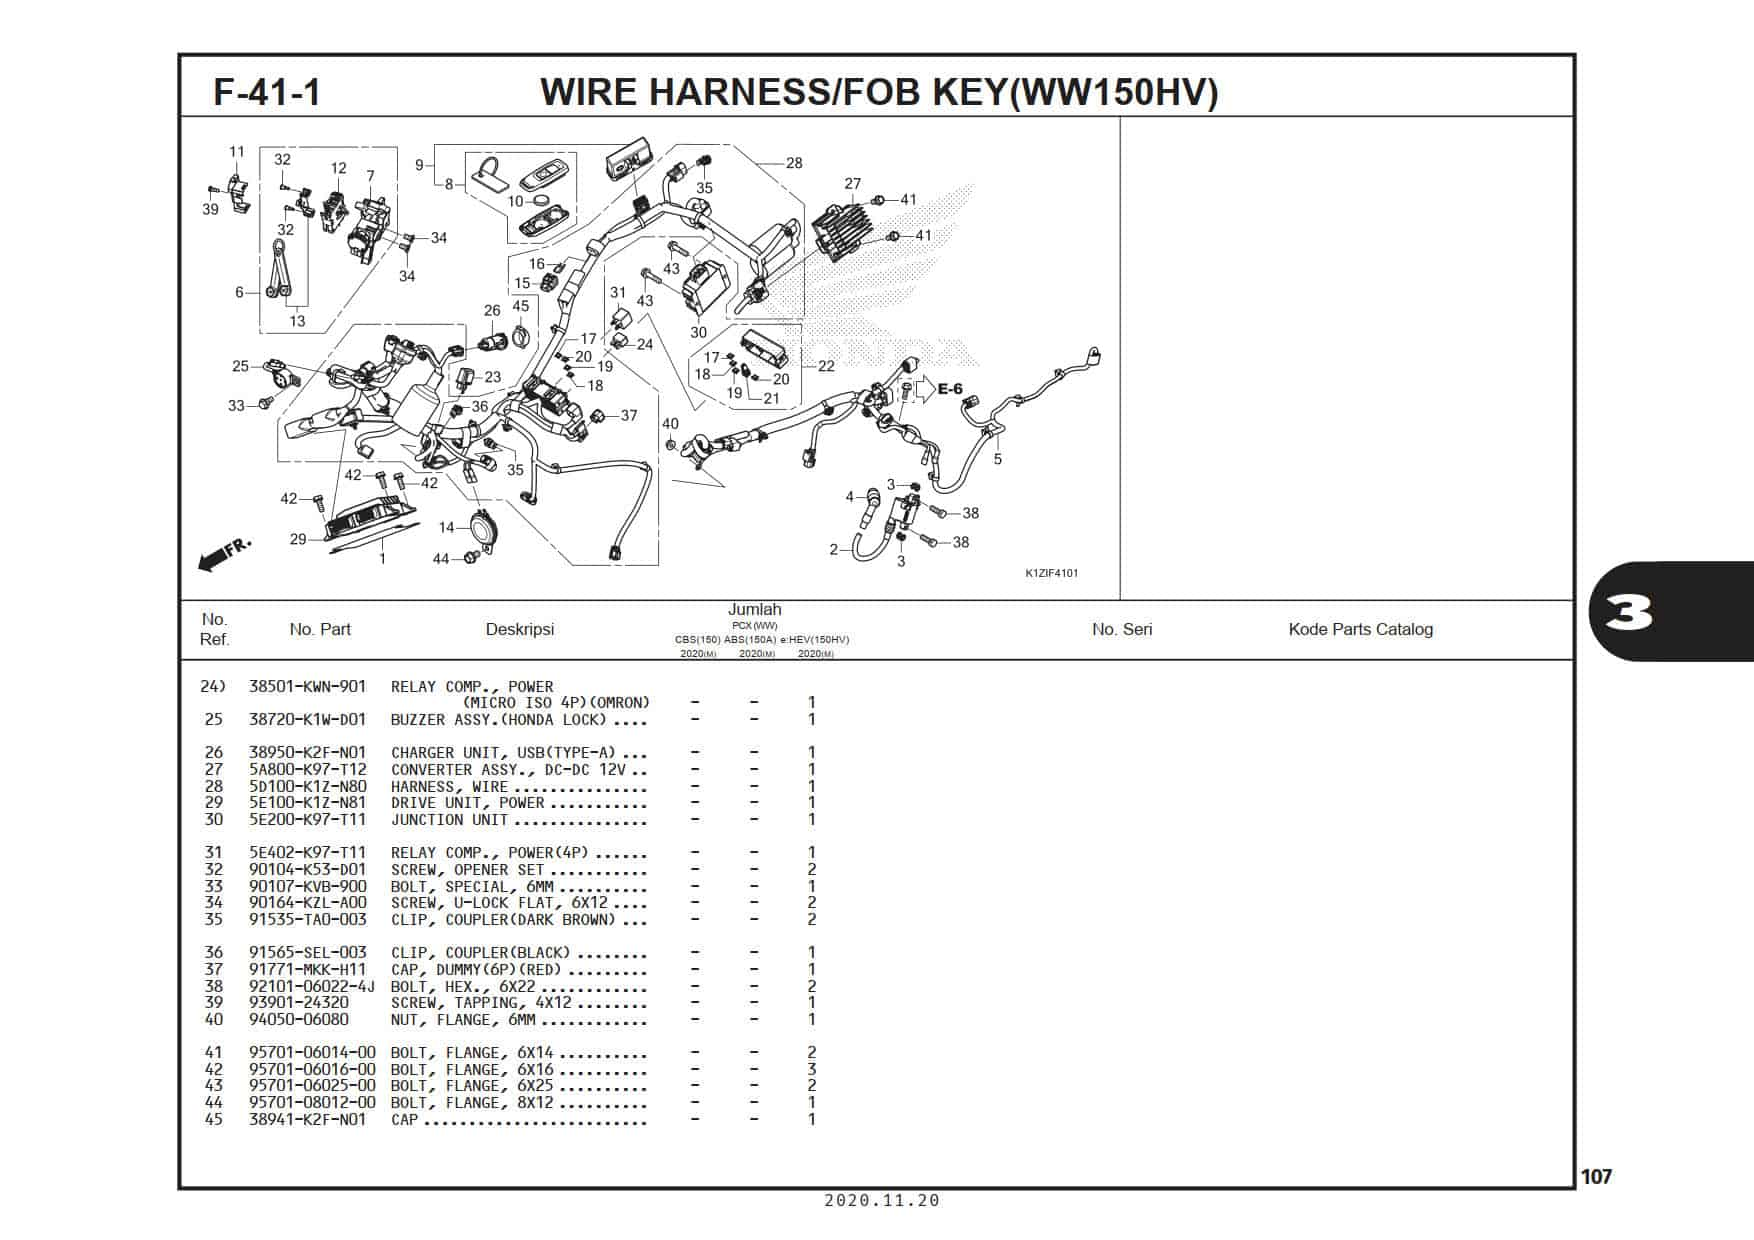 F-41-1 Wire Harness/FOB KEY (WW150HV)